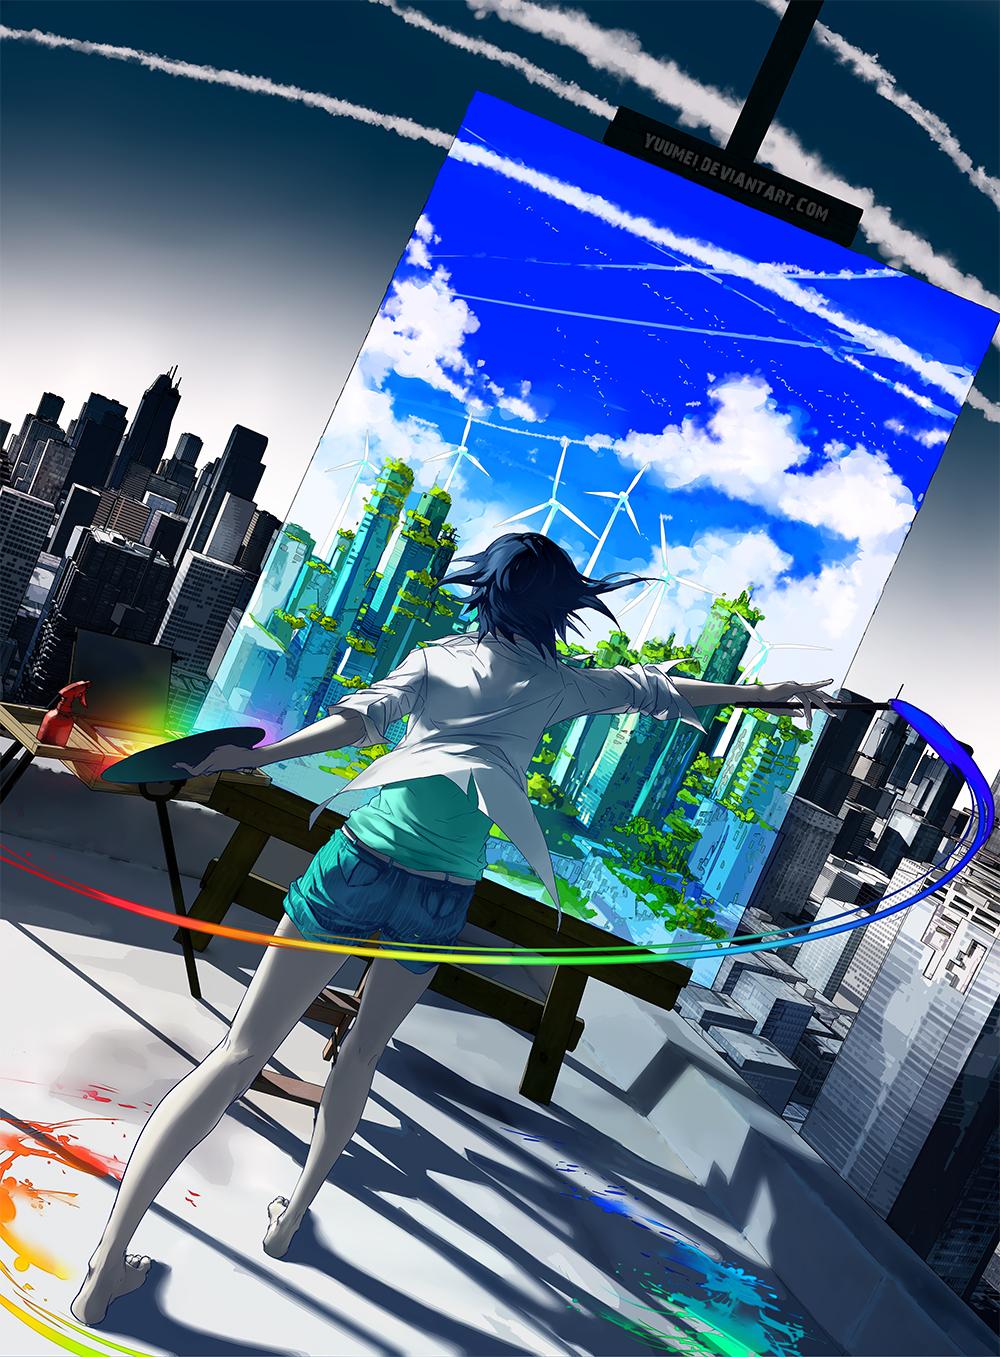 Re-Imagine by yuumei